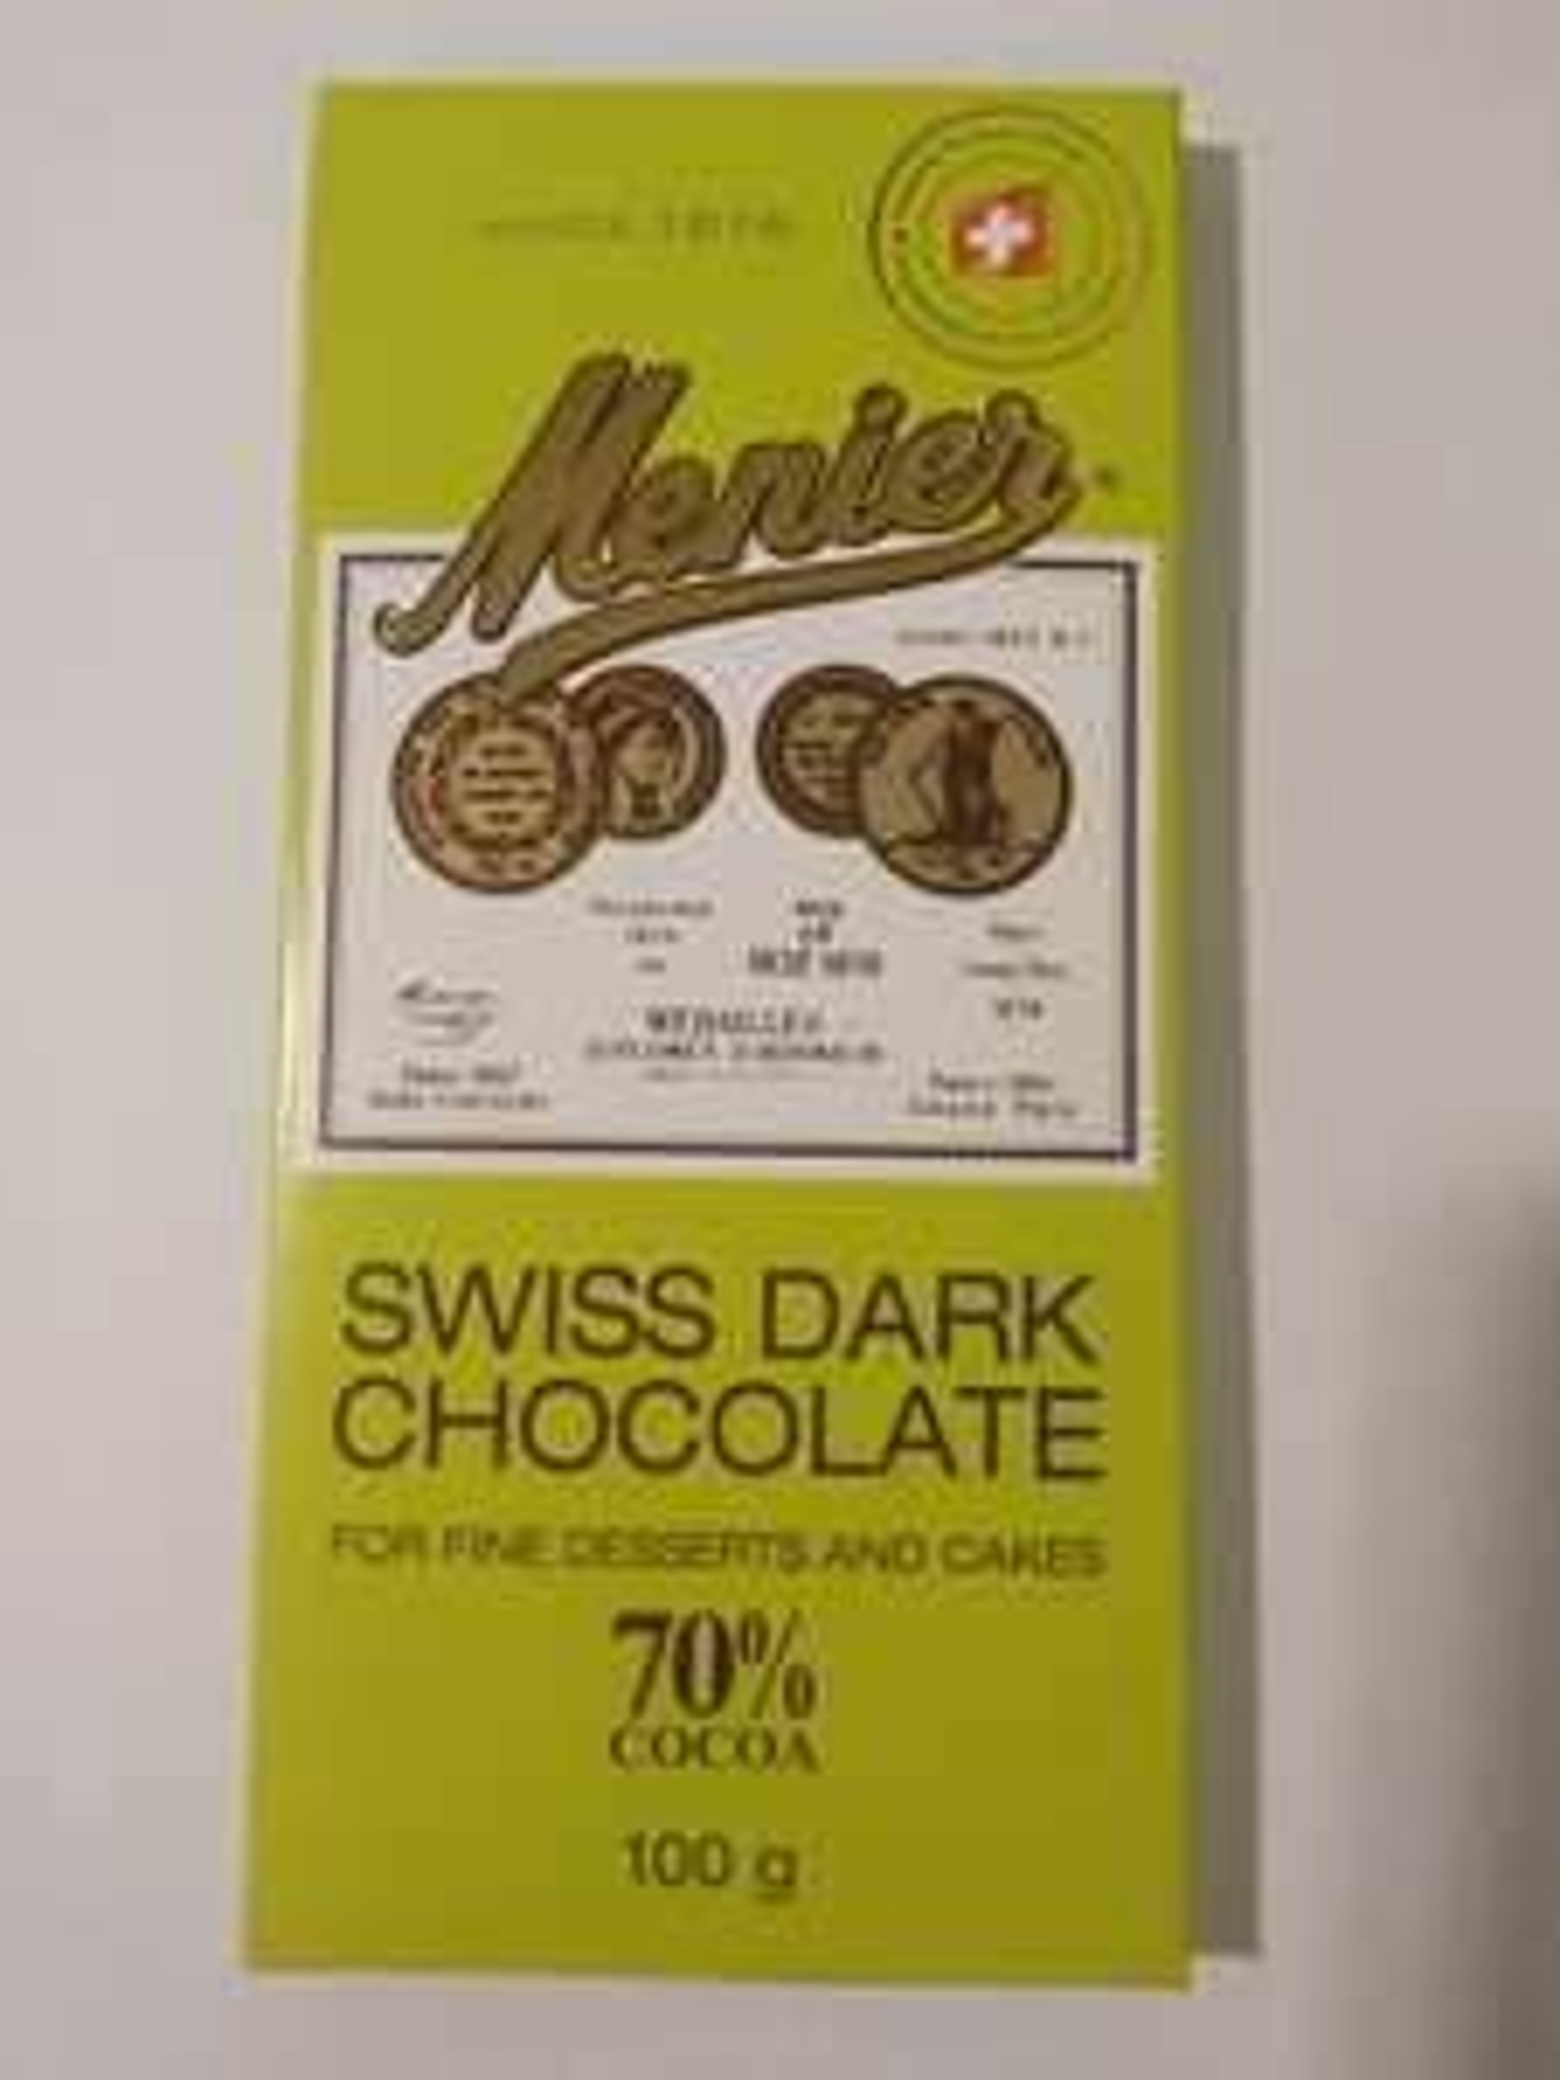 Menier 70% Swiss Dark Cooking/Baking Chocolate 59p at Home Bargains Kendal, Cumbria